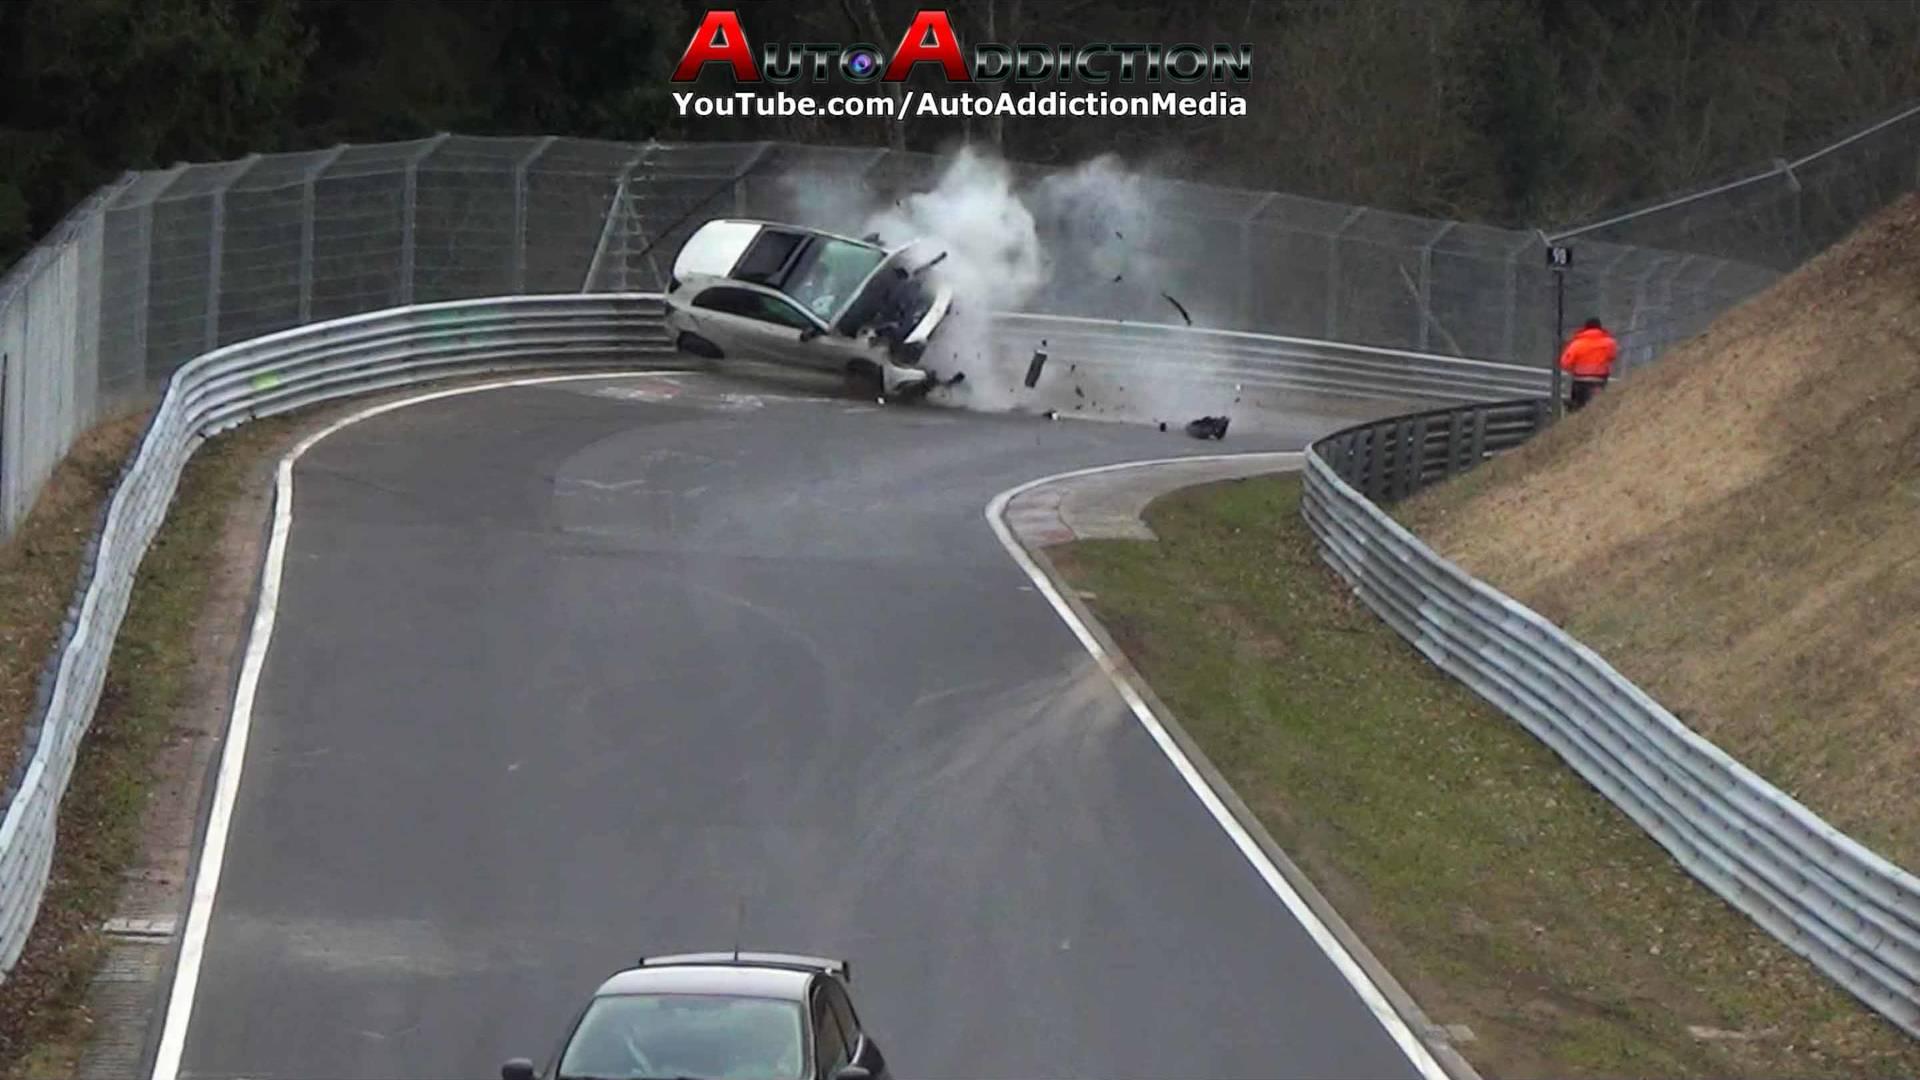 Mercedes A-Class Occupants Walk Away After Terrifying 'Ring Crash